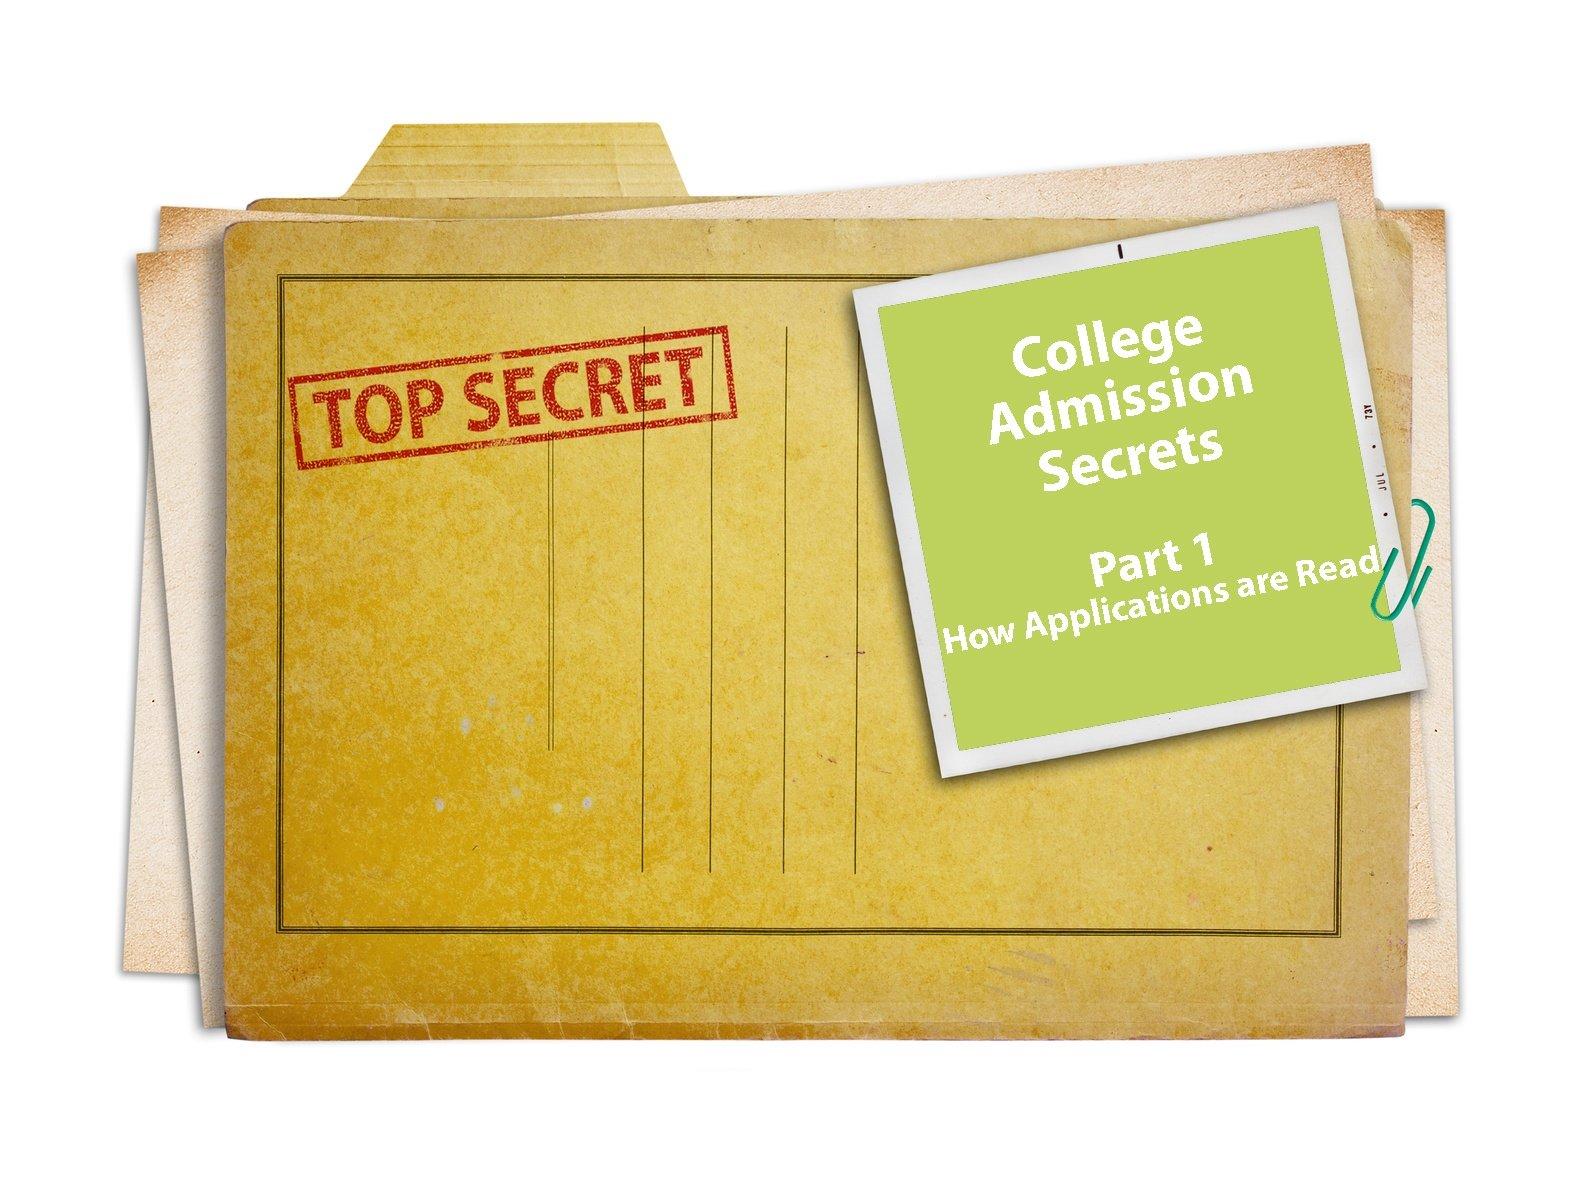 College Admission Secrets Pt. 1